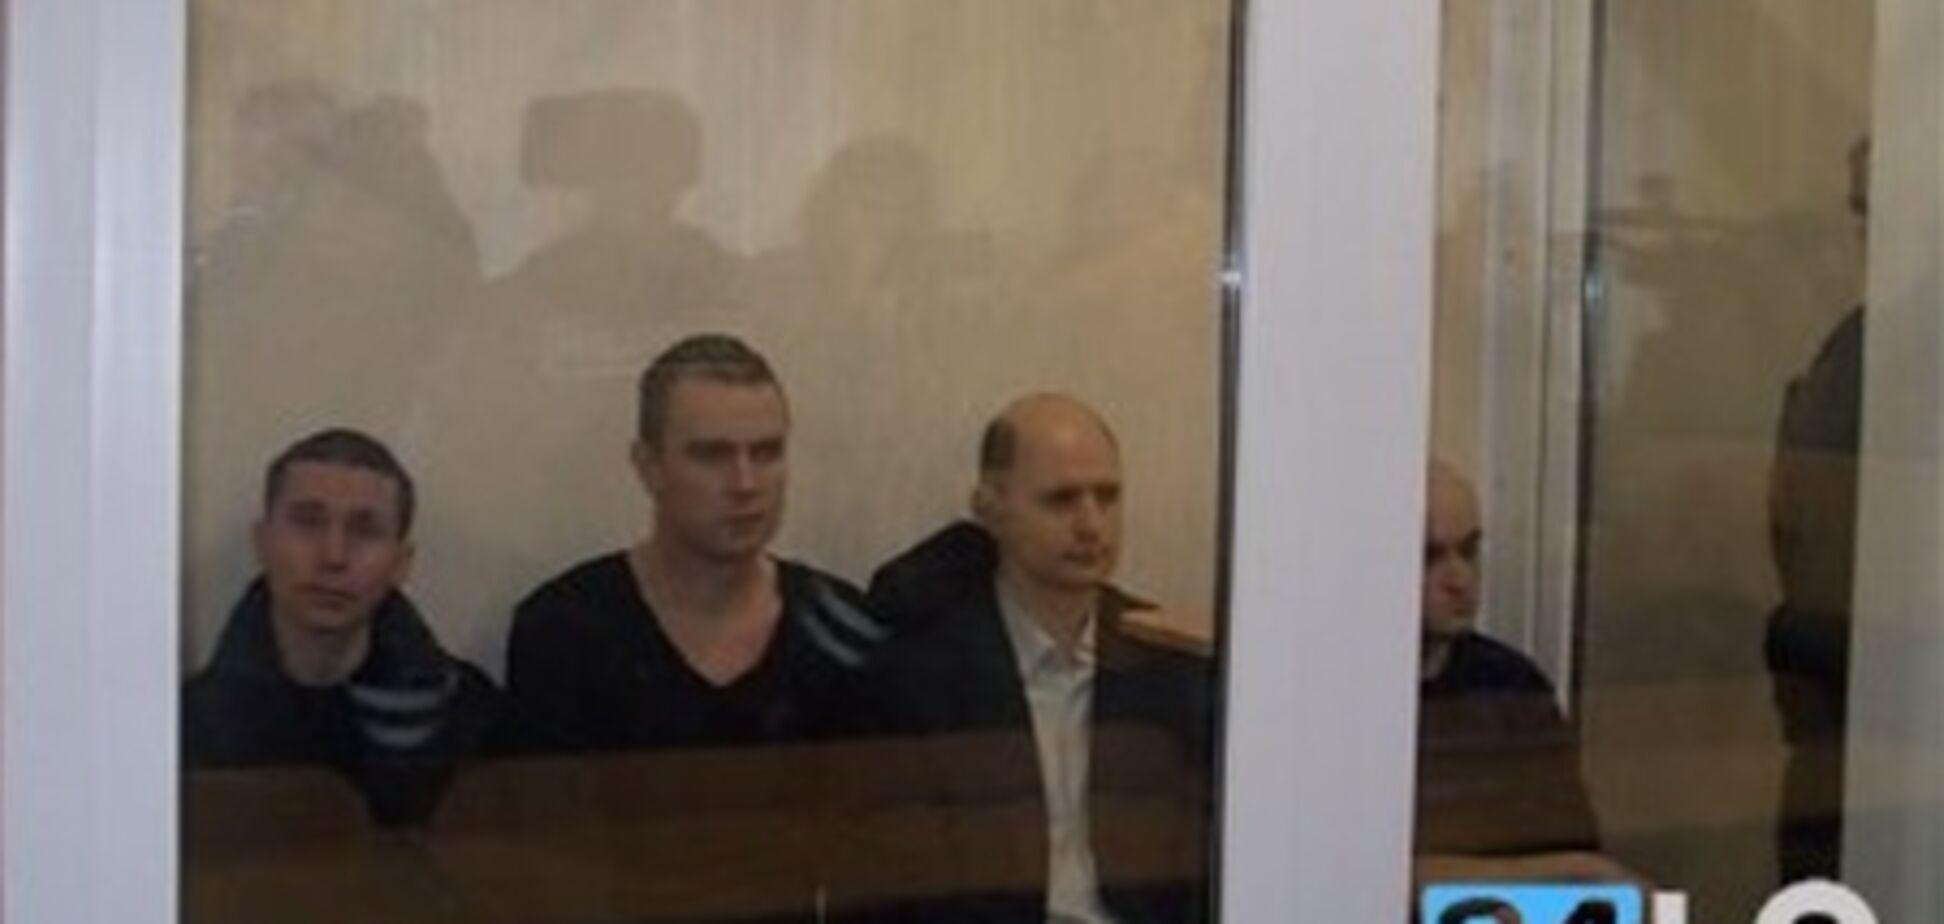 Днепропетровским террористам предъявлены иски на 1,4 миллиона